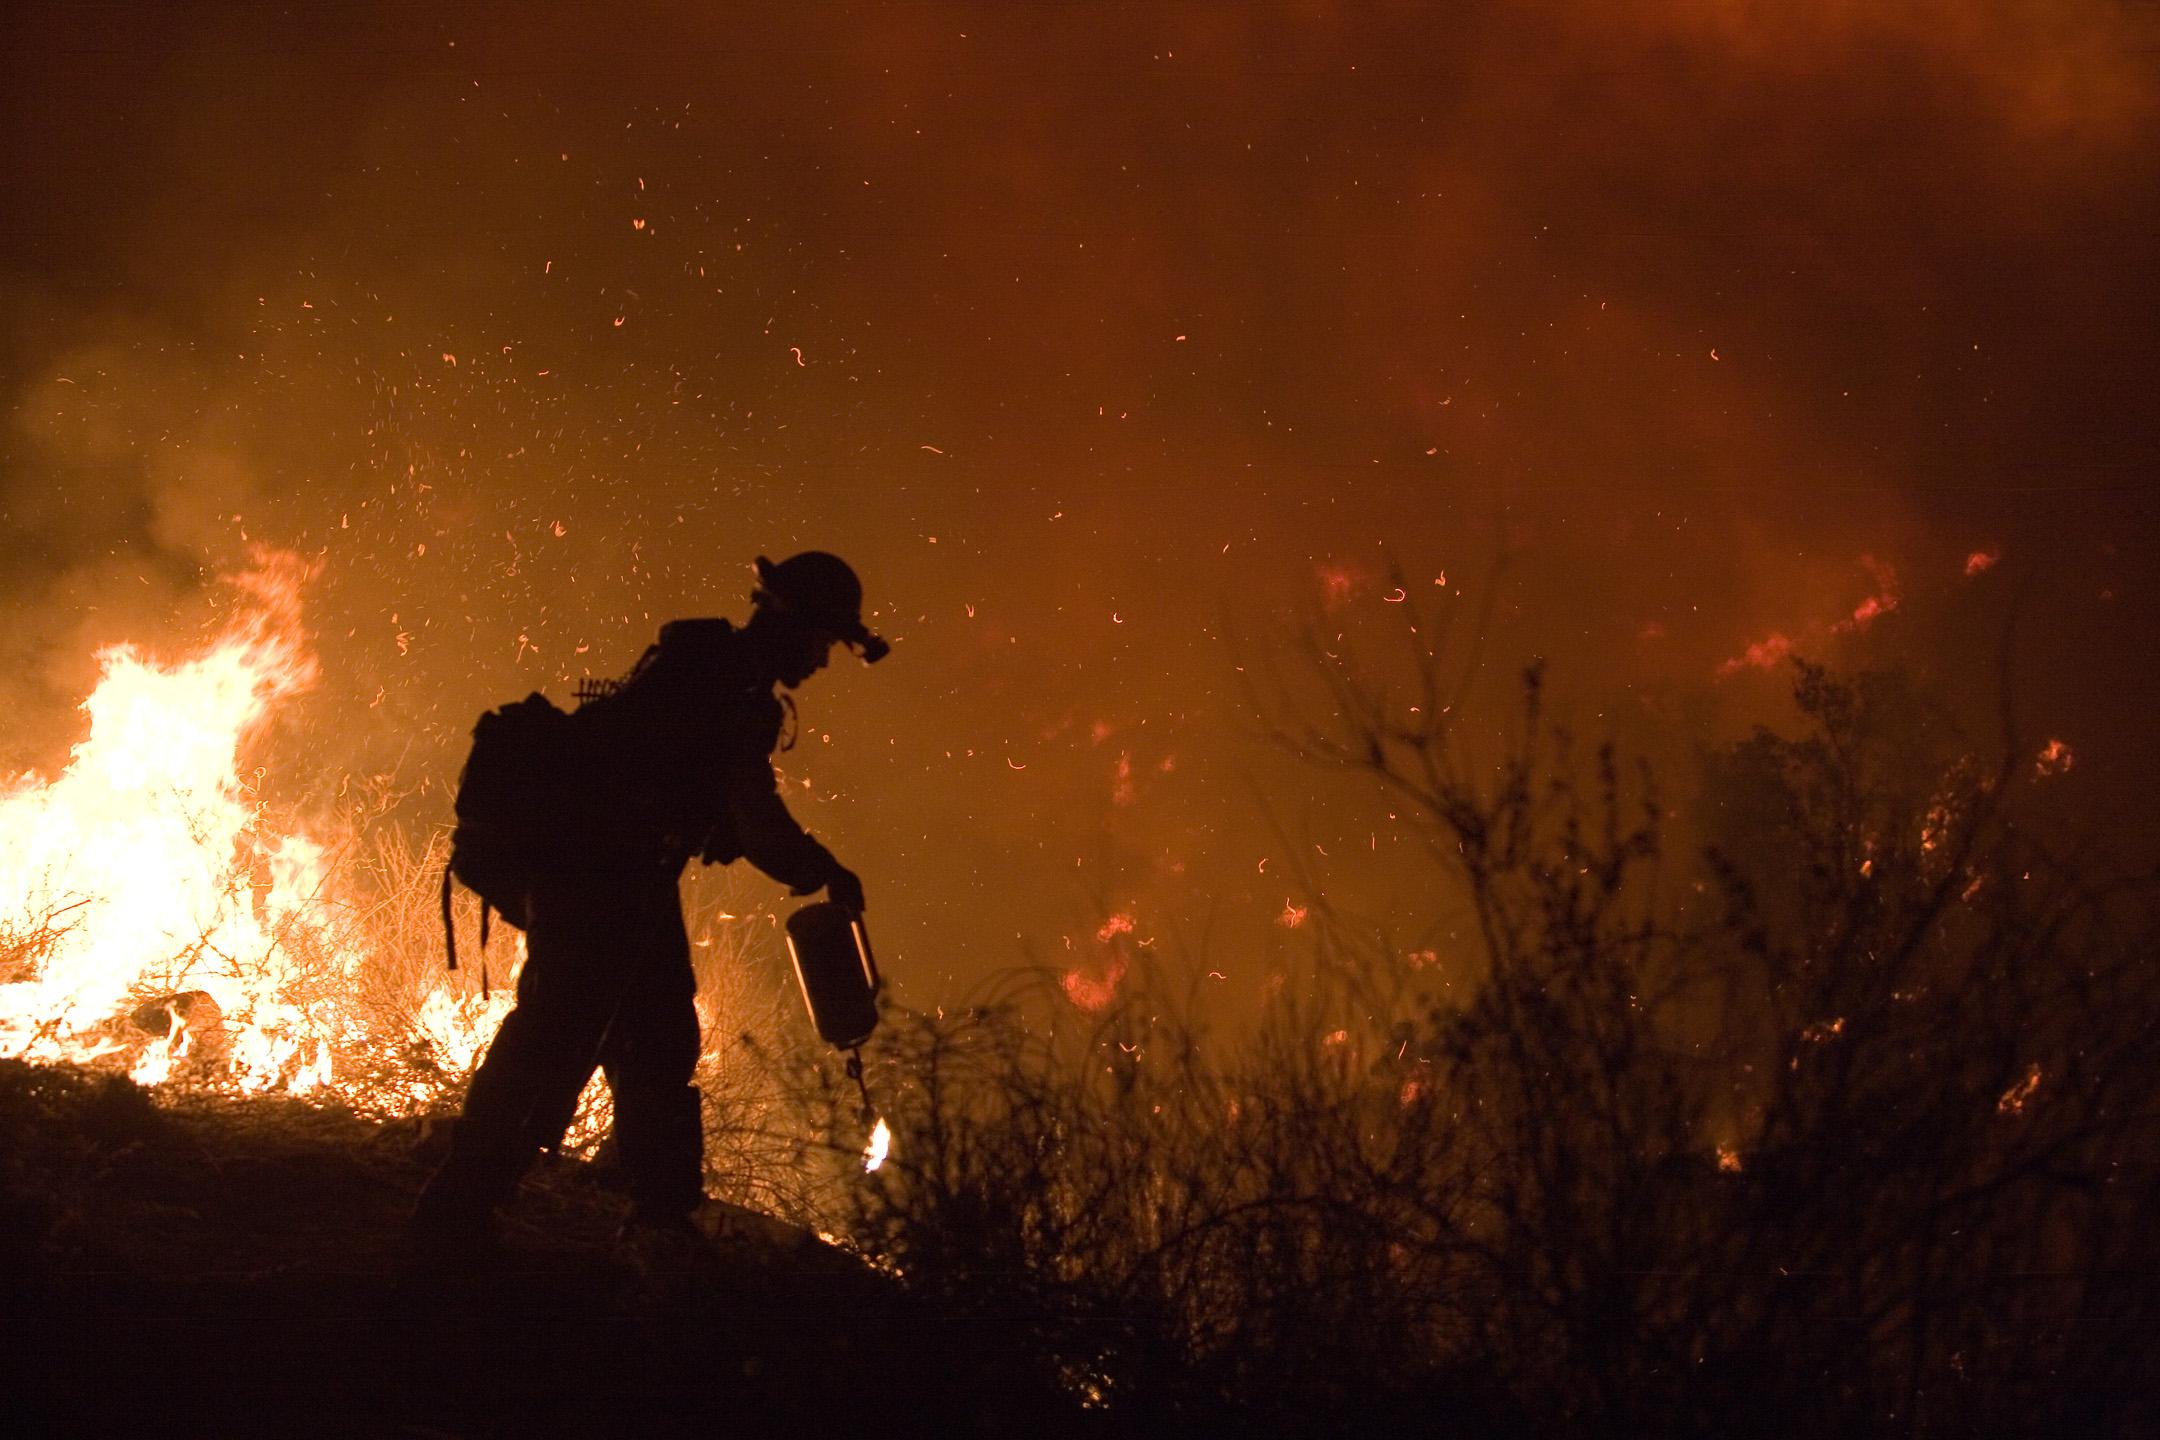 2014_08_FEMA_-_33311_-_Fire_crew_memeber_fighting_Poomacha_wildfire_in_California